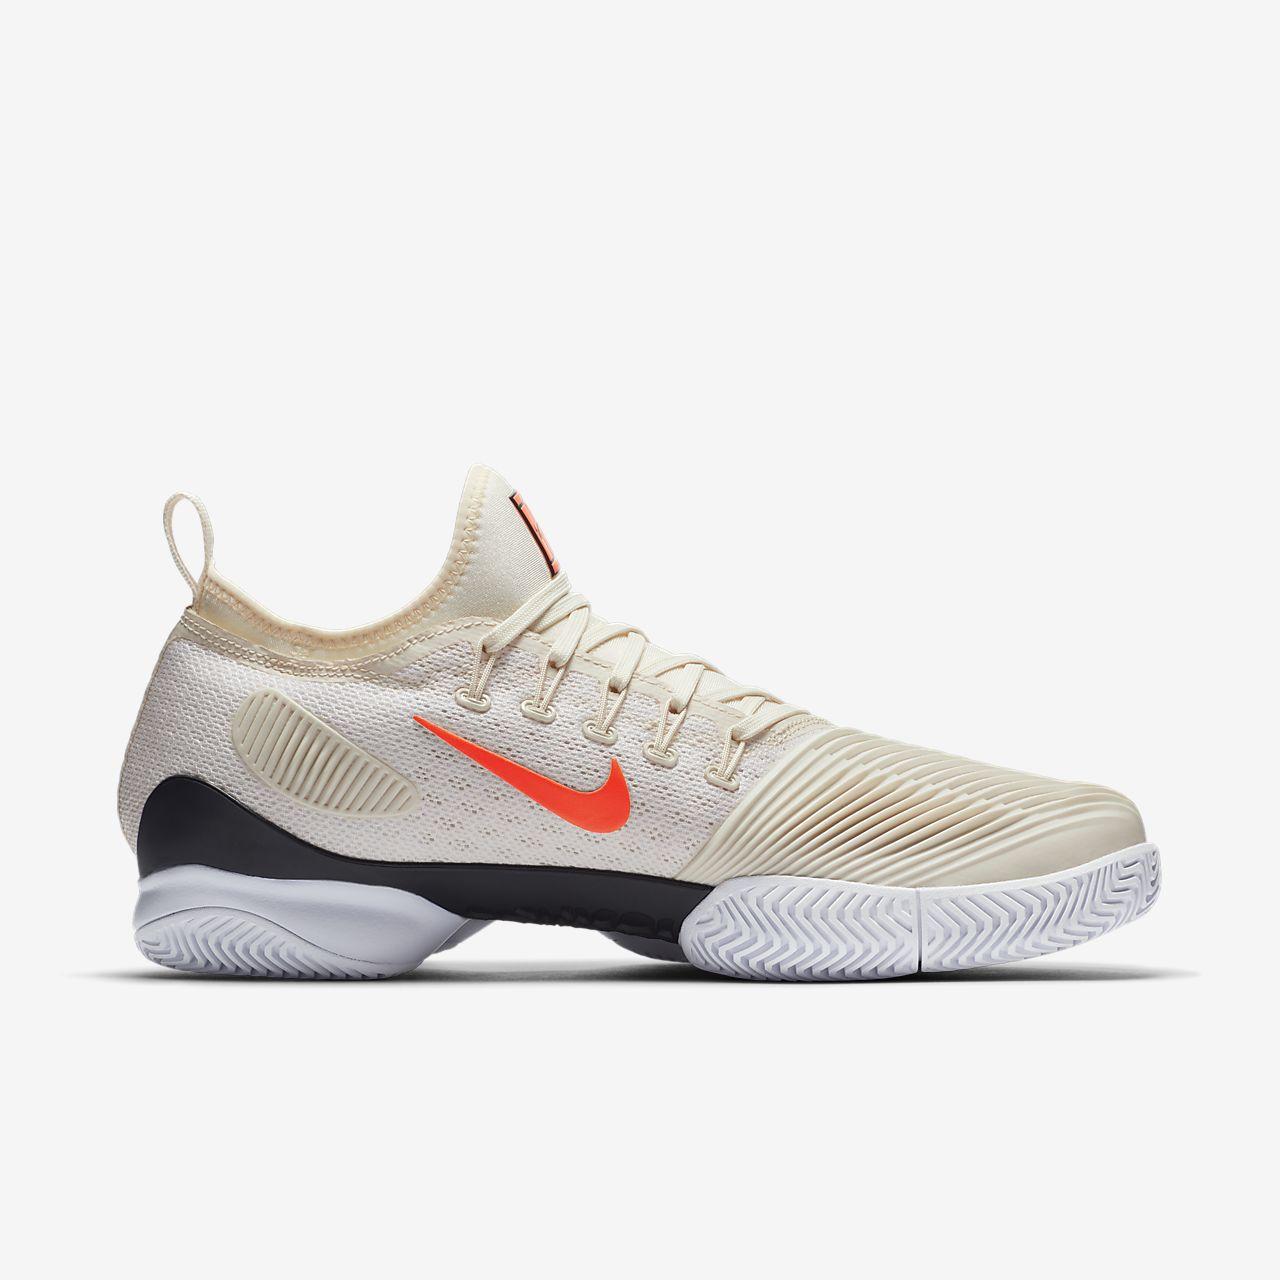 Nikecourt Air Zoom Ultra React Tennis Sneakers Nike IOBDcvE0ER